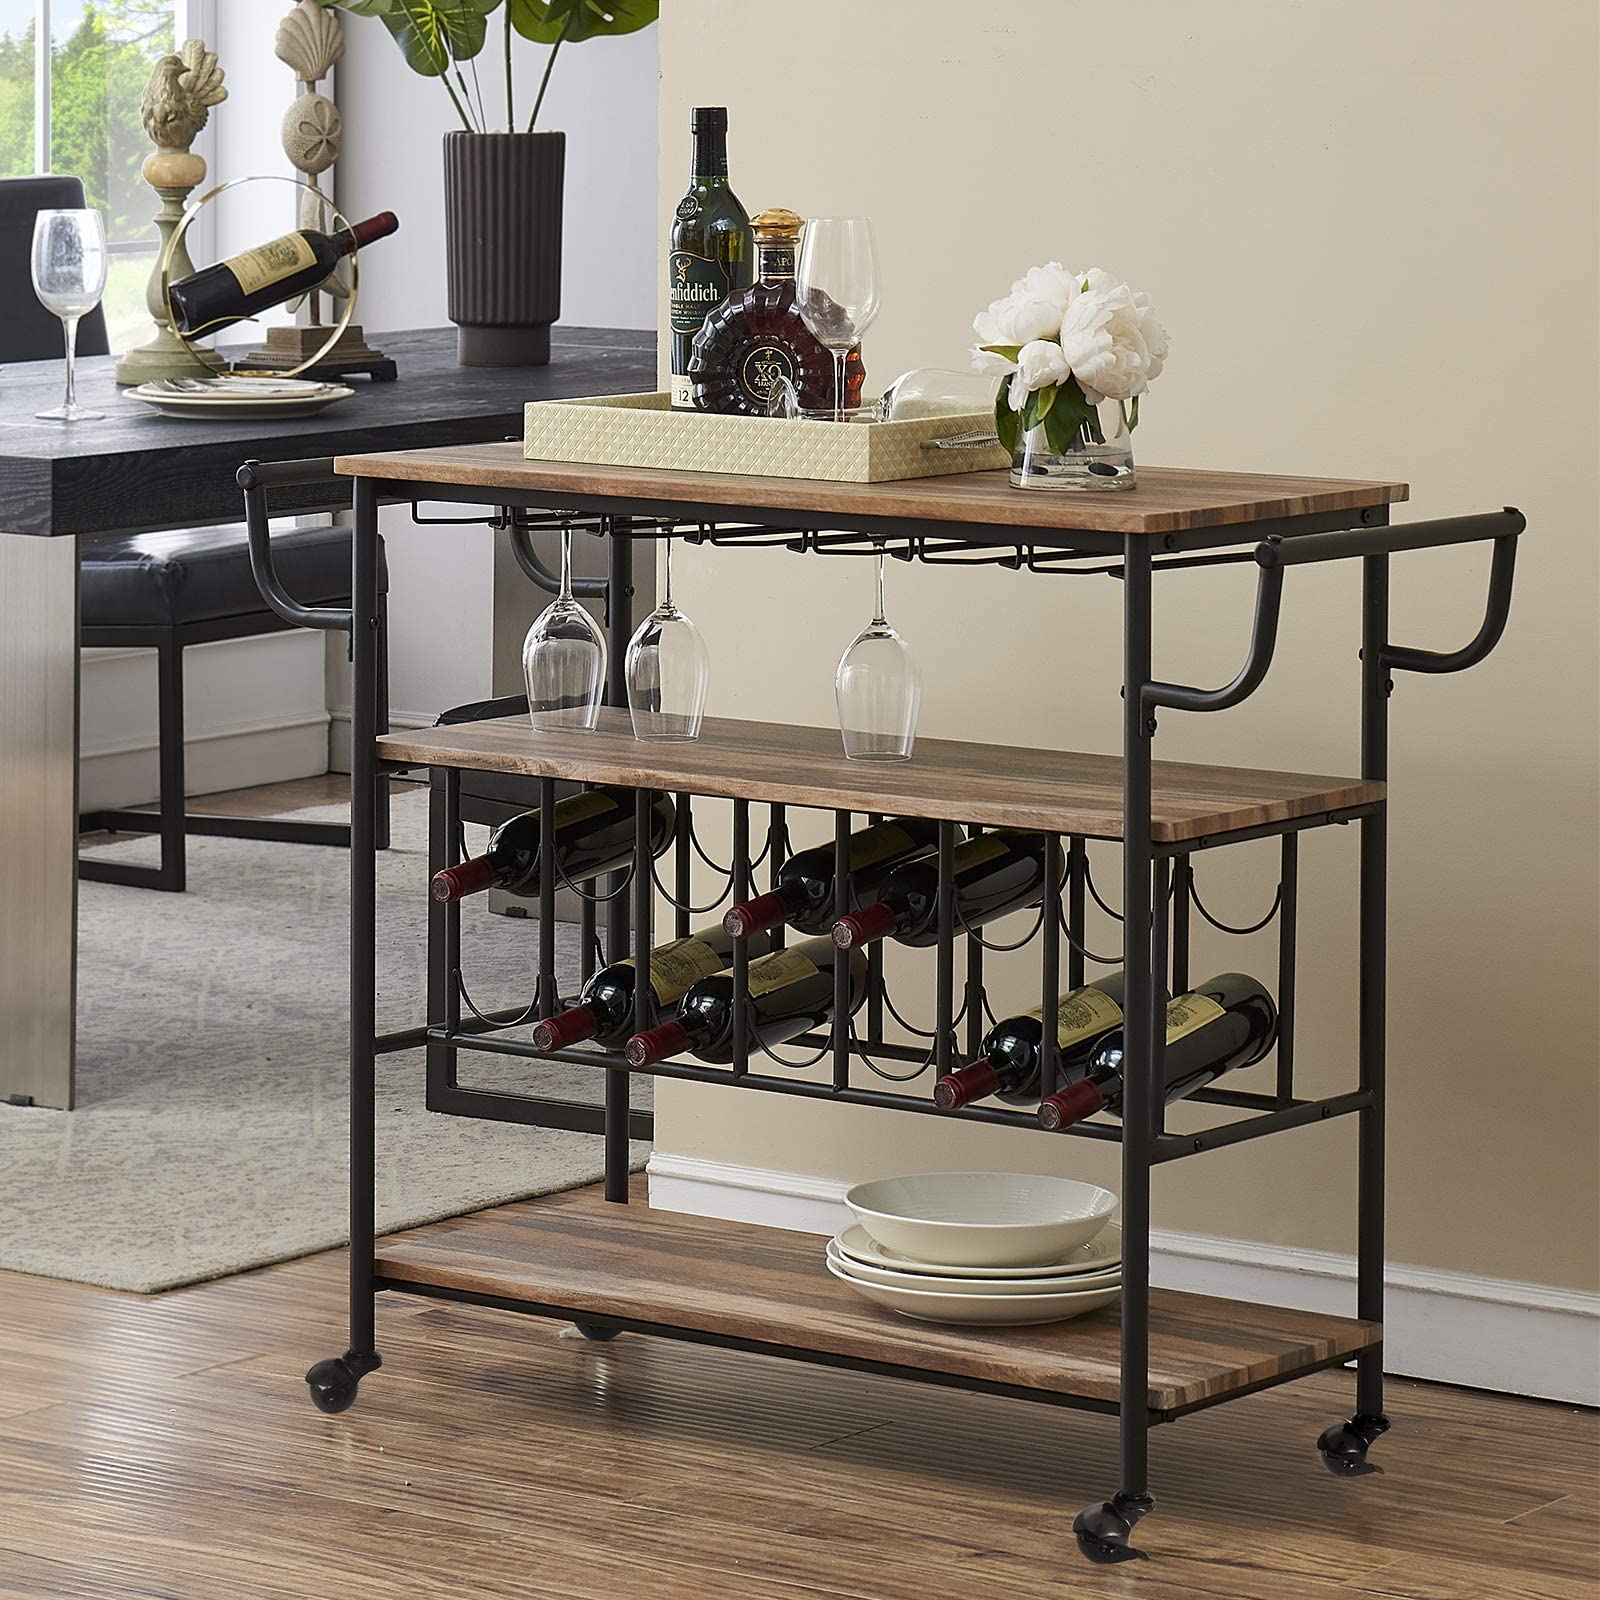 SOLD Rustic  Industrial serving wagon  beverage  tea cart  rolling buffet